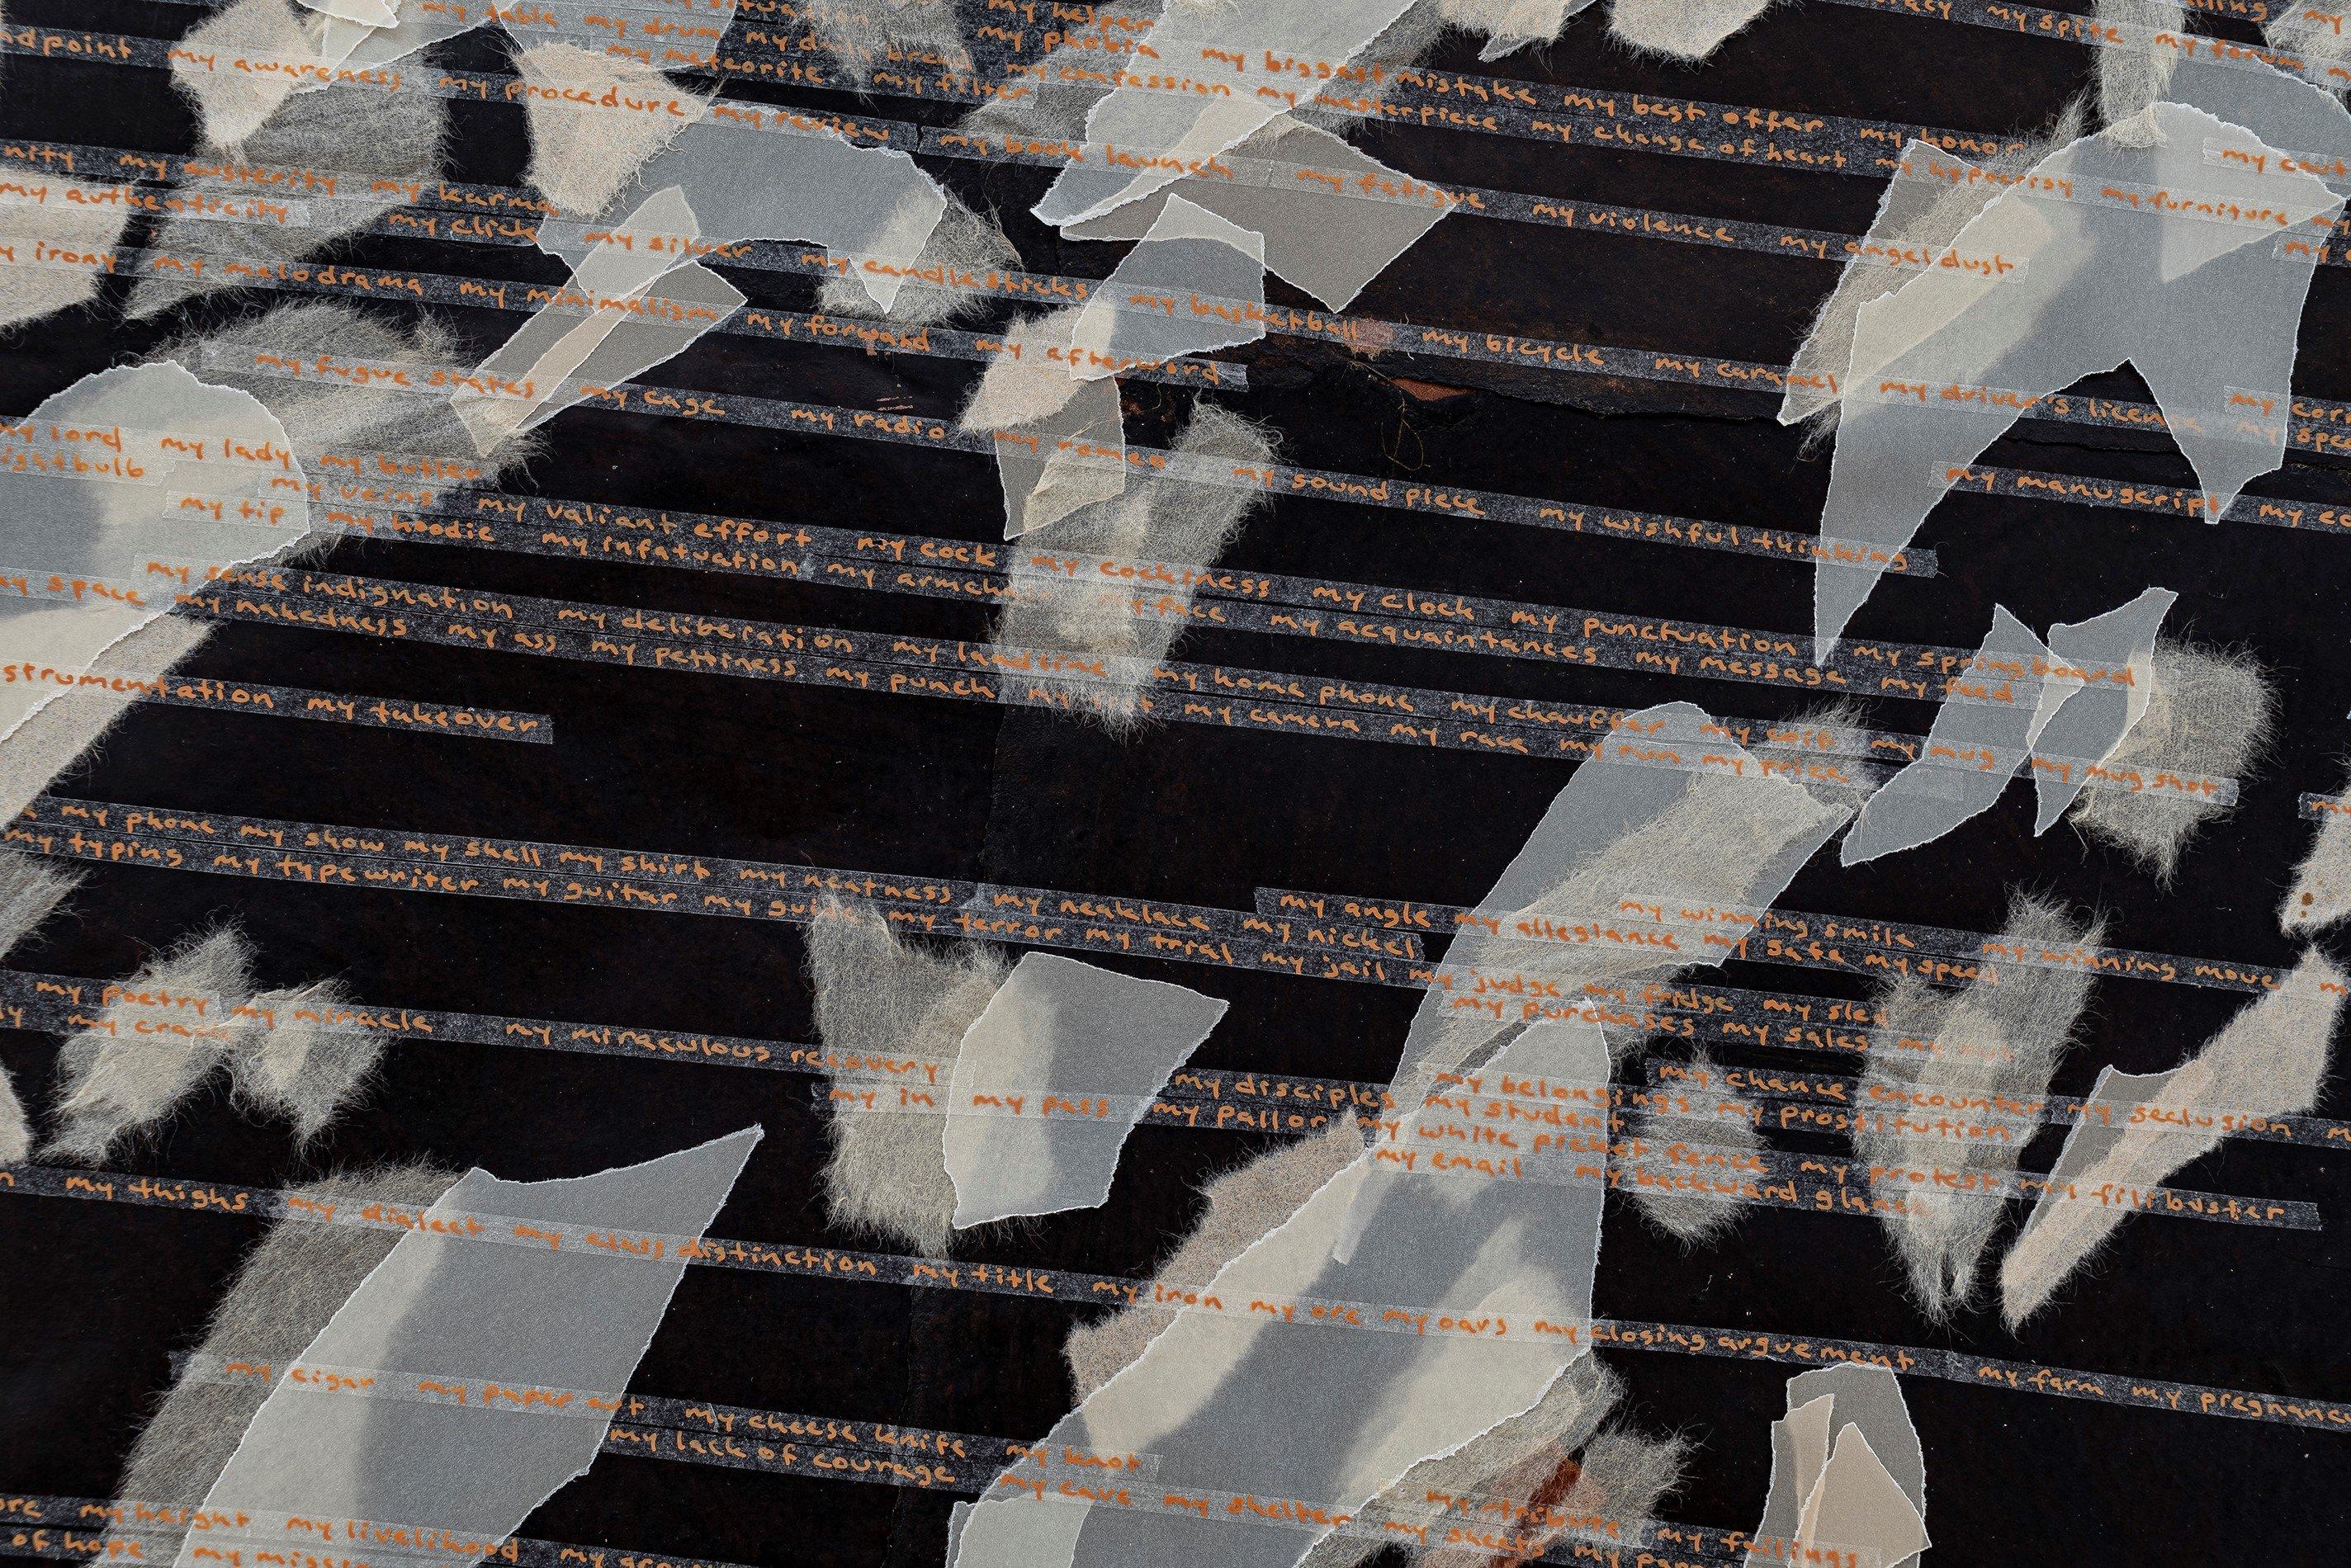 'mine,' 2014, ink on mending tape on hemp paper, vellum and handmade Japanese paper, 132 by 190 centimeters. (Courtesy of Arter)